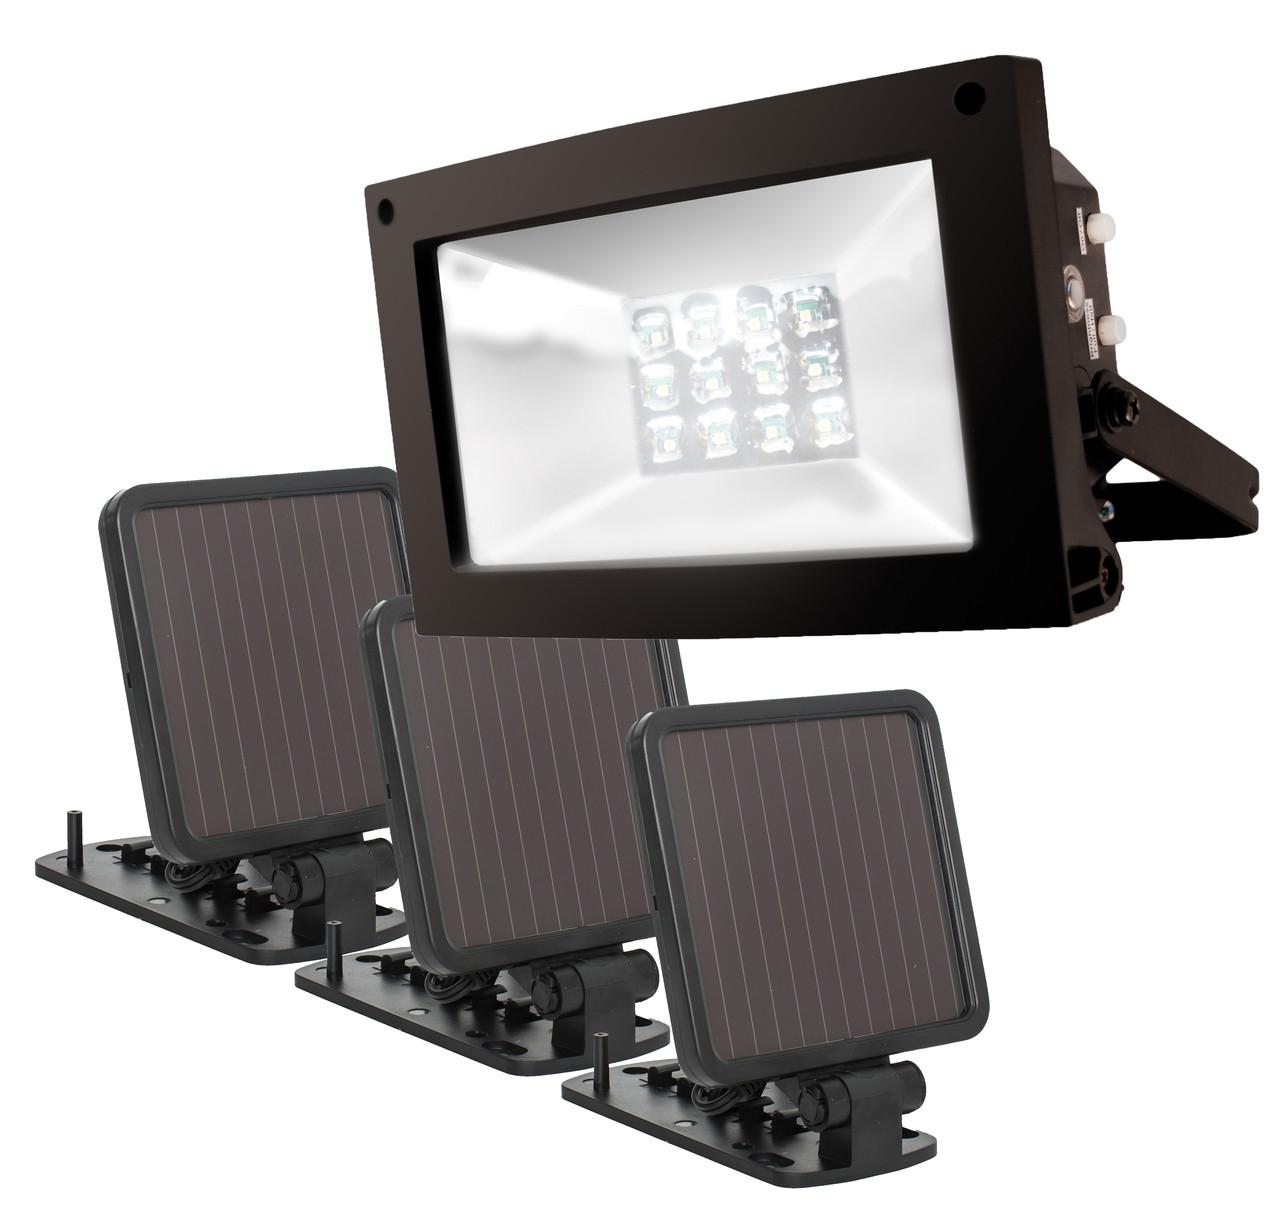 SolarPowered UltraBright Flood Light MAXSA Innovations